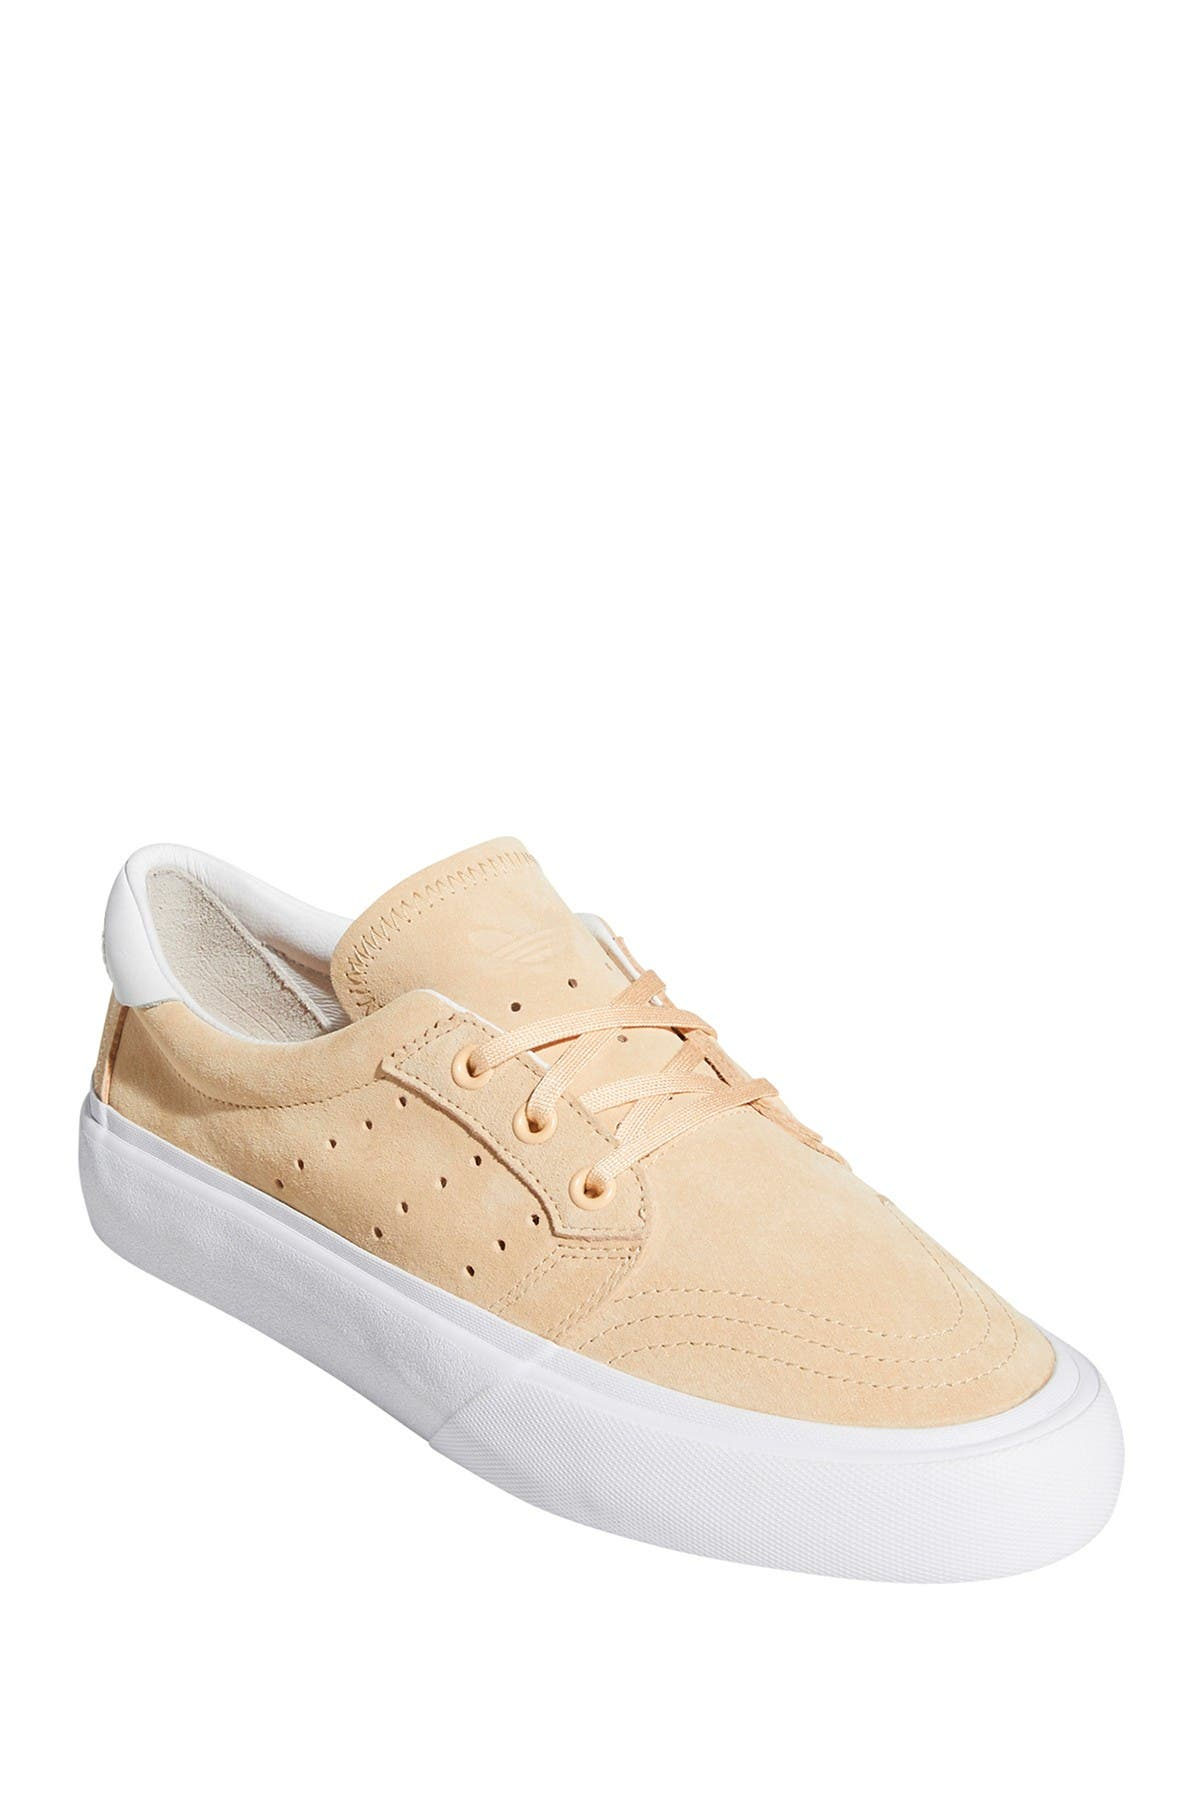 Image of adidas Coronado Sneaker